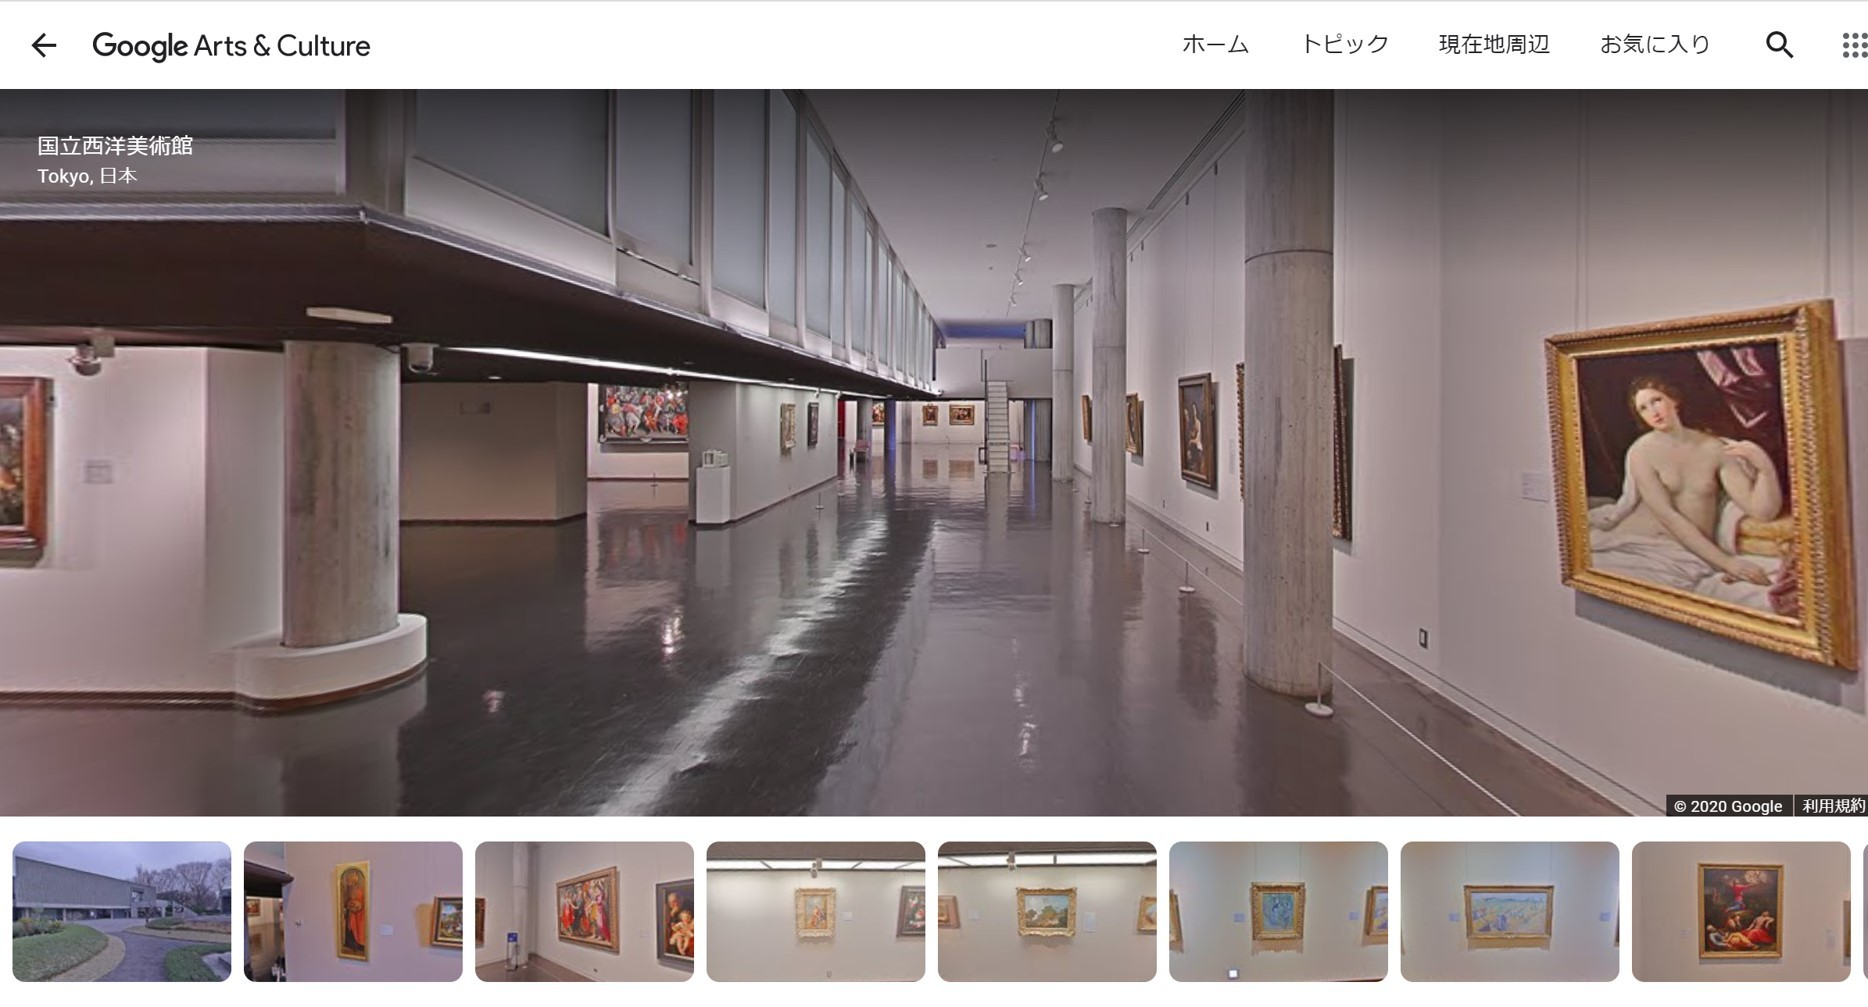 Google Arts & Culture 国立西洋美術館 ストリートビュー画面 サイトより